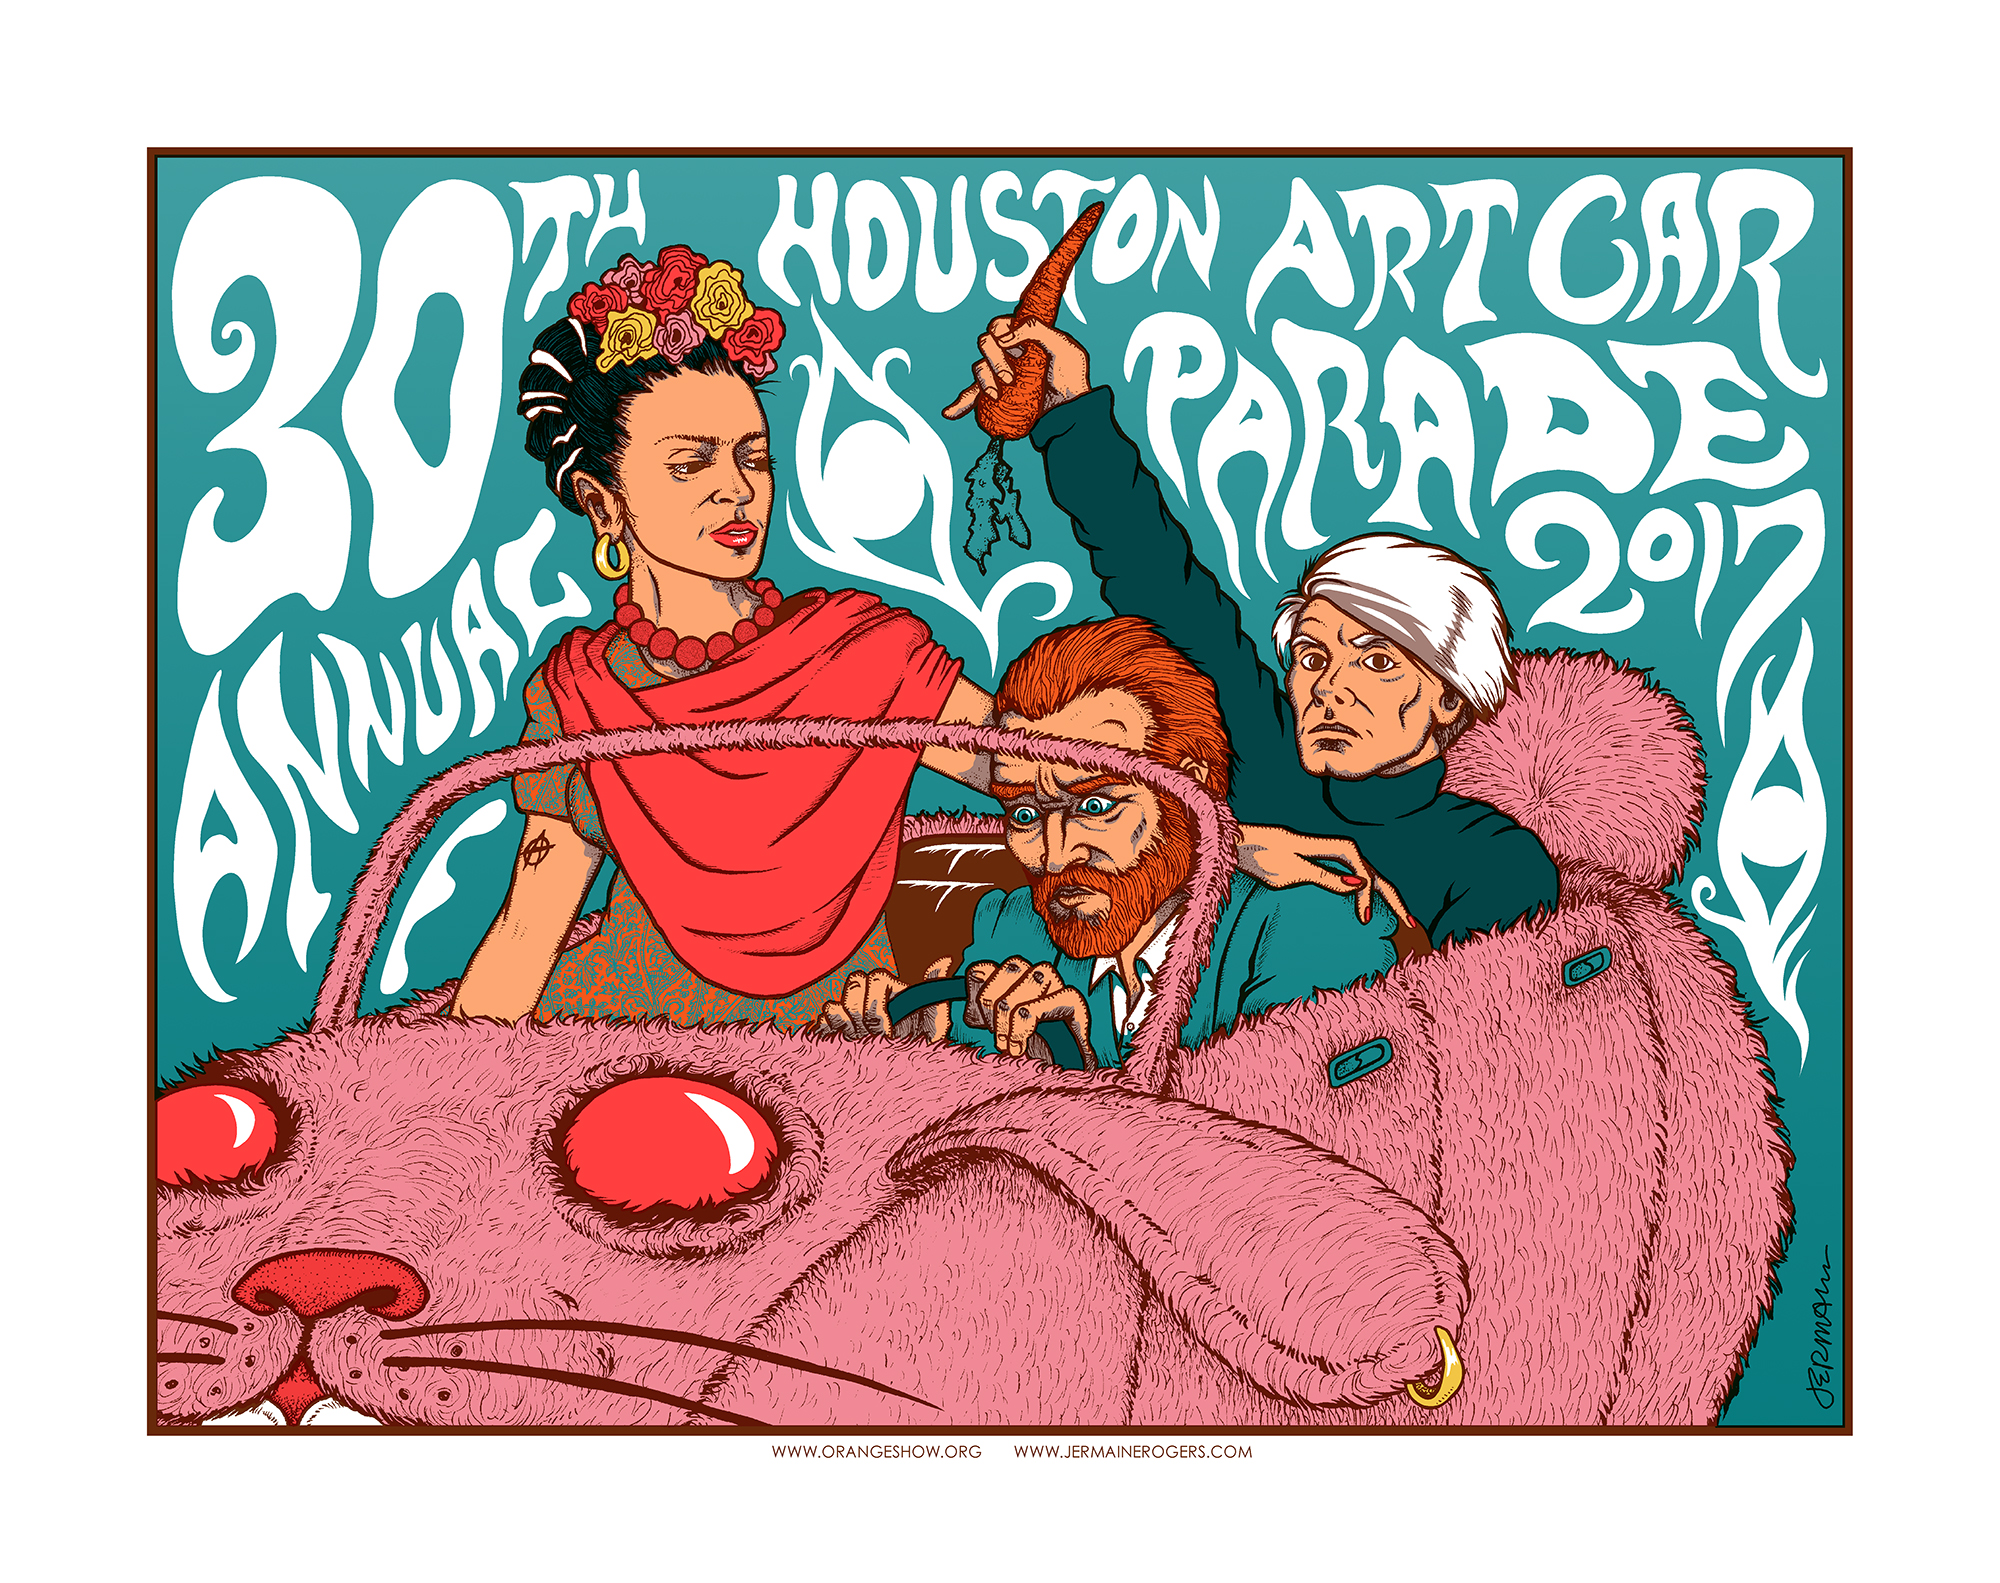 NEW - Houston Art Car Parade 2017 30th Anniversary Commemorative Print -